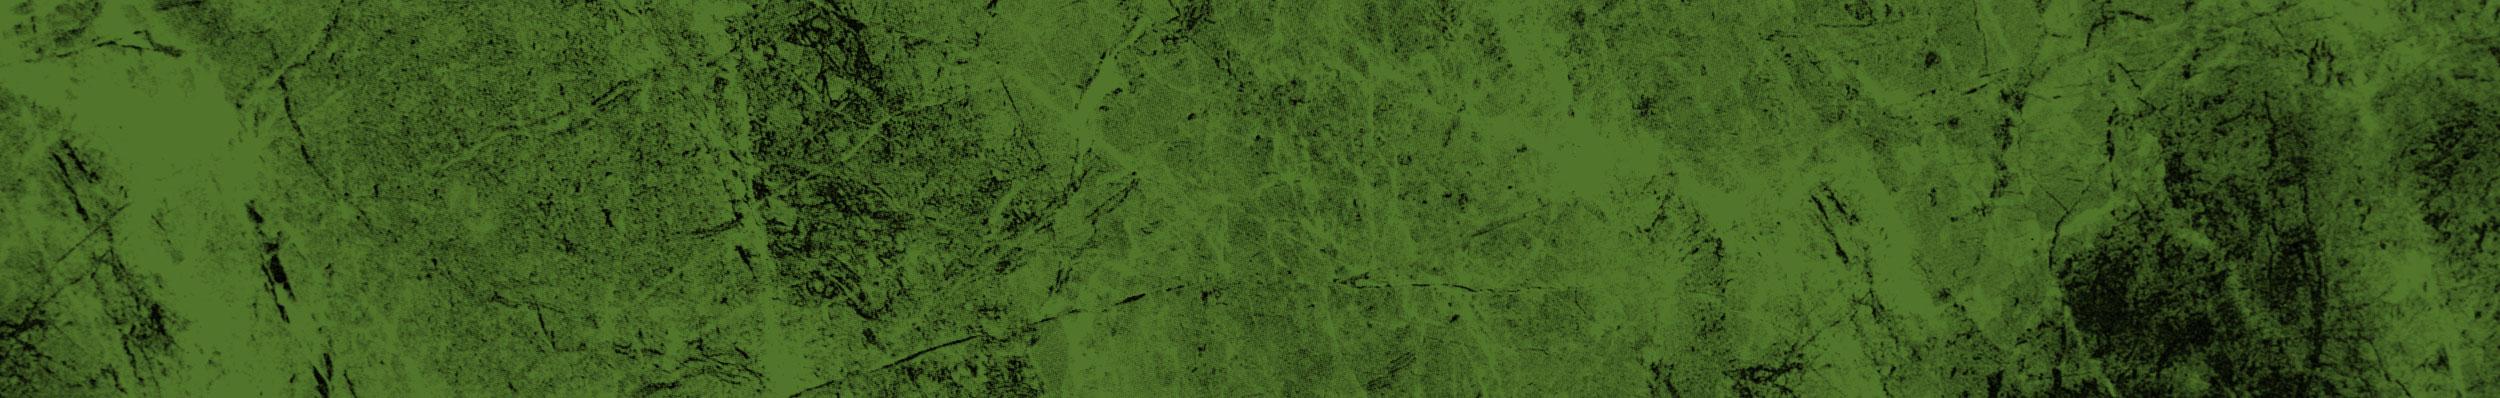 PNG - Area Riservata - Background